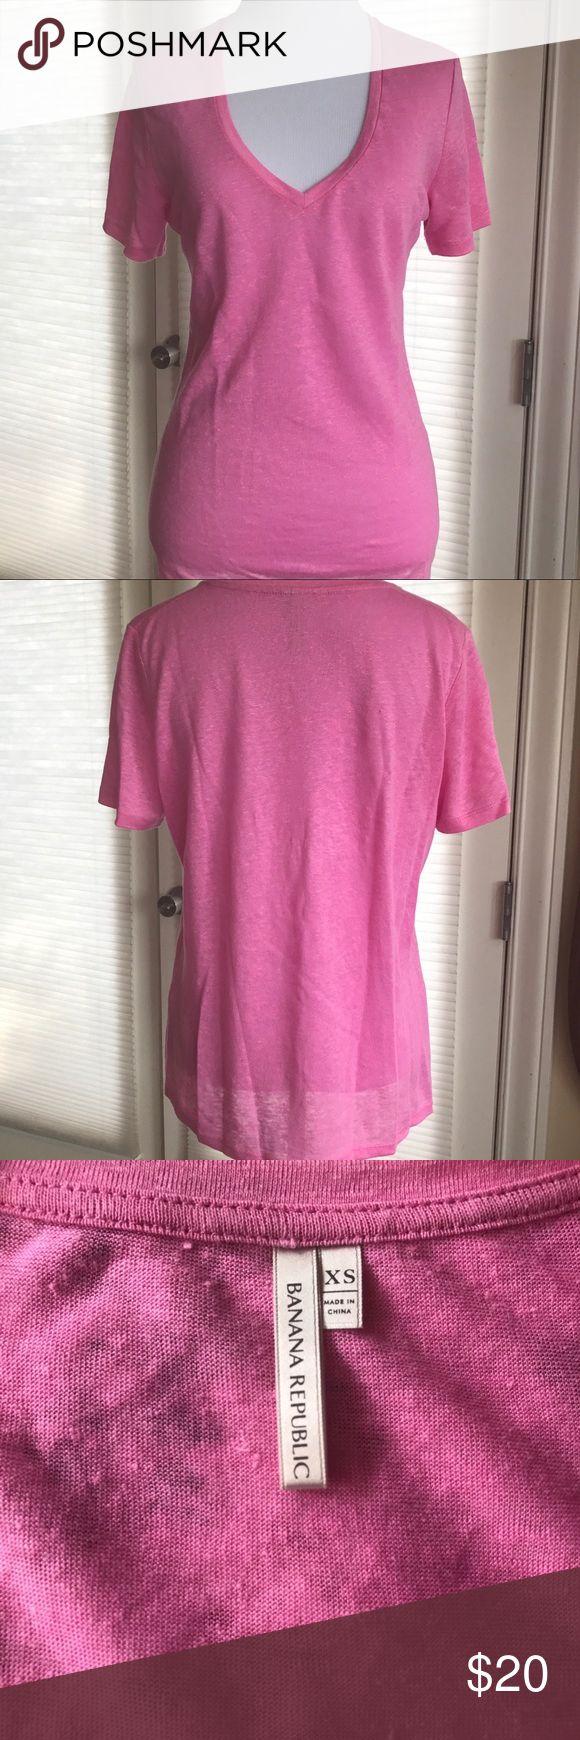 Banana Republic Deep V Neck Linen TShirt. NWOT Never worn.  Great shade of pink.  NWOT Banana Republic Tops Tees - Short Sleeve